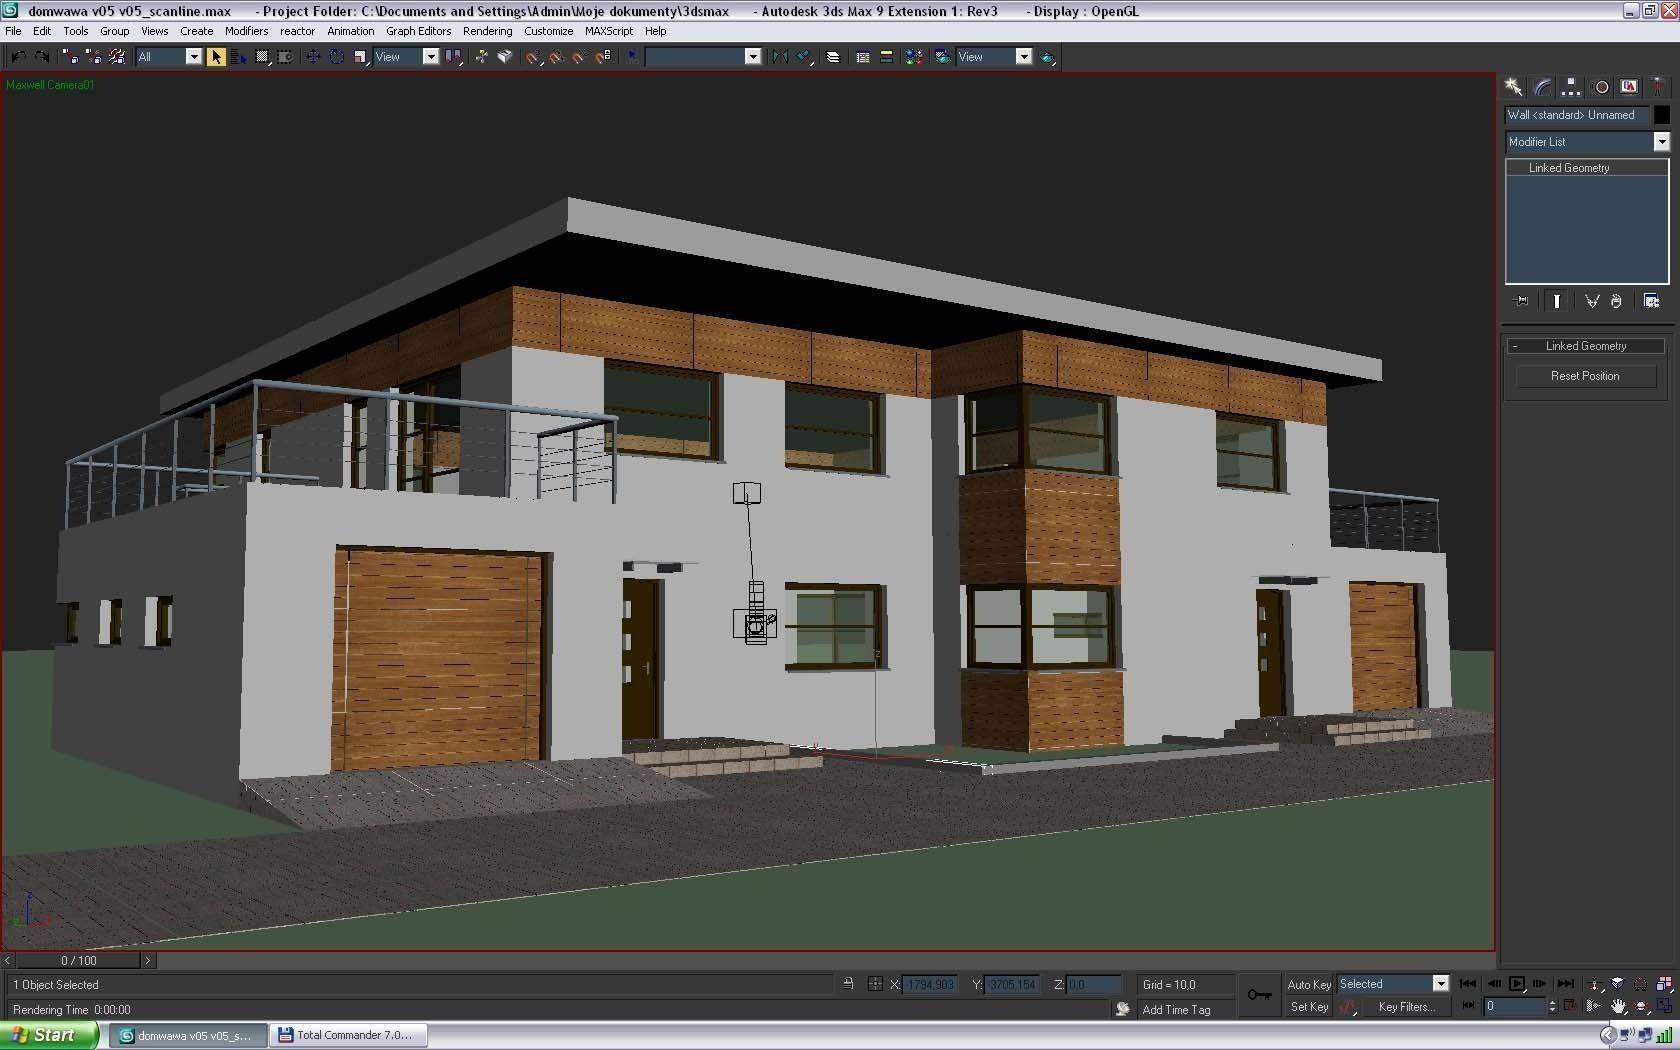 Minimalist modern house 3d model m 3ds fb 4d lwo lw lws m mb